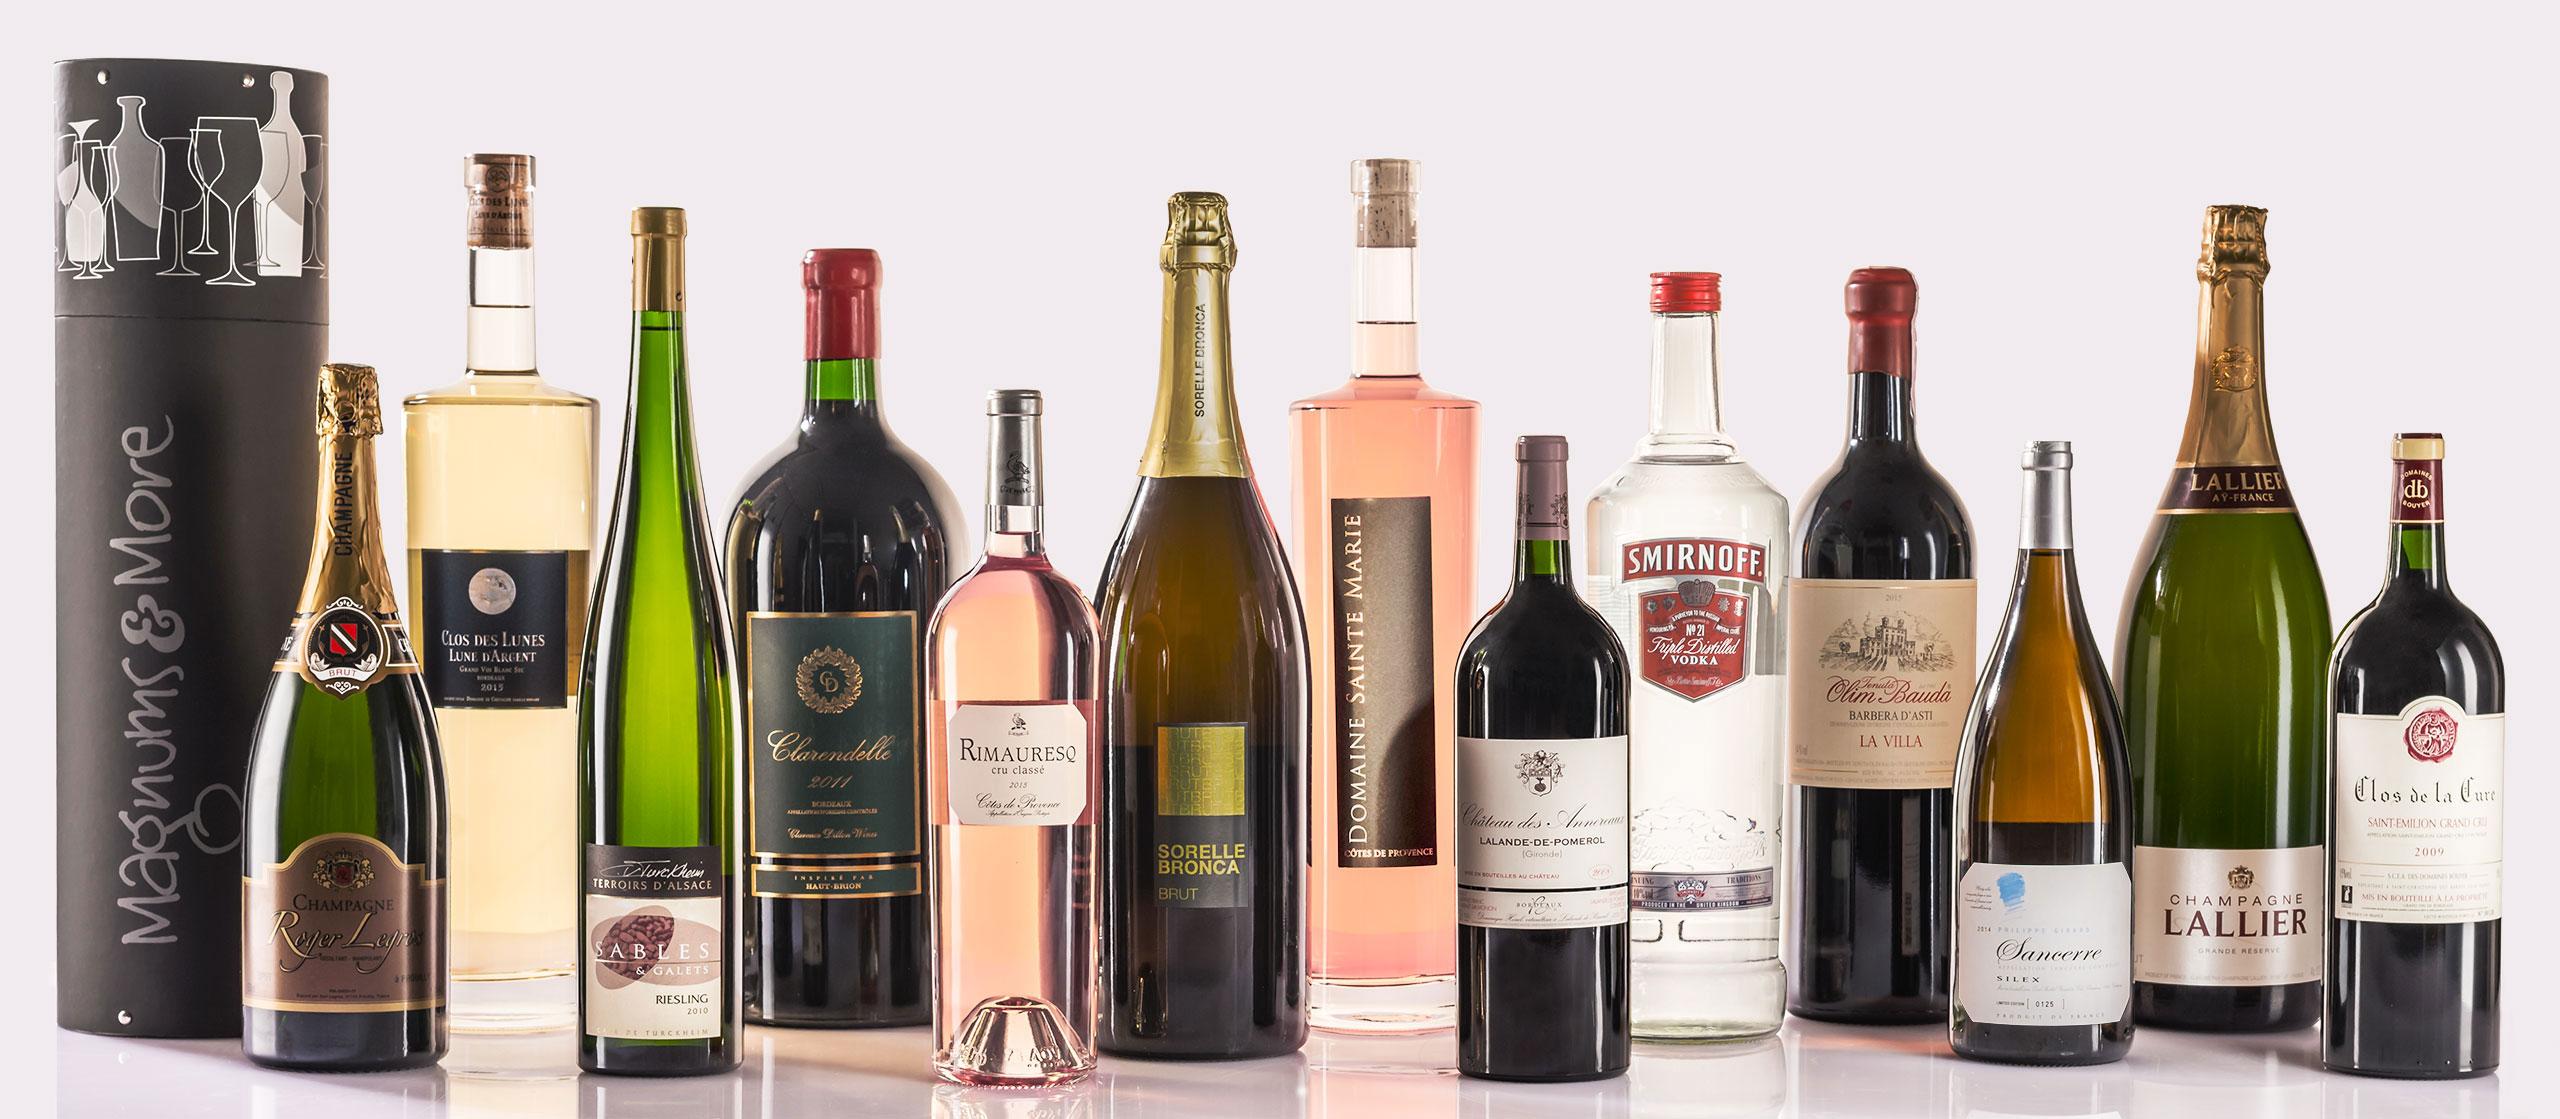 magnum wine bottles